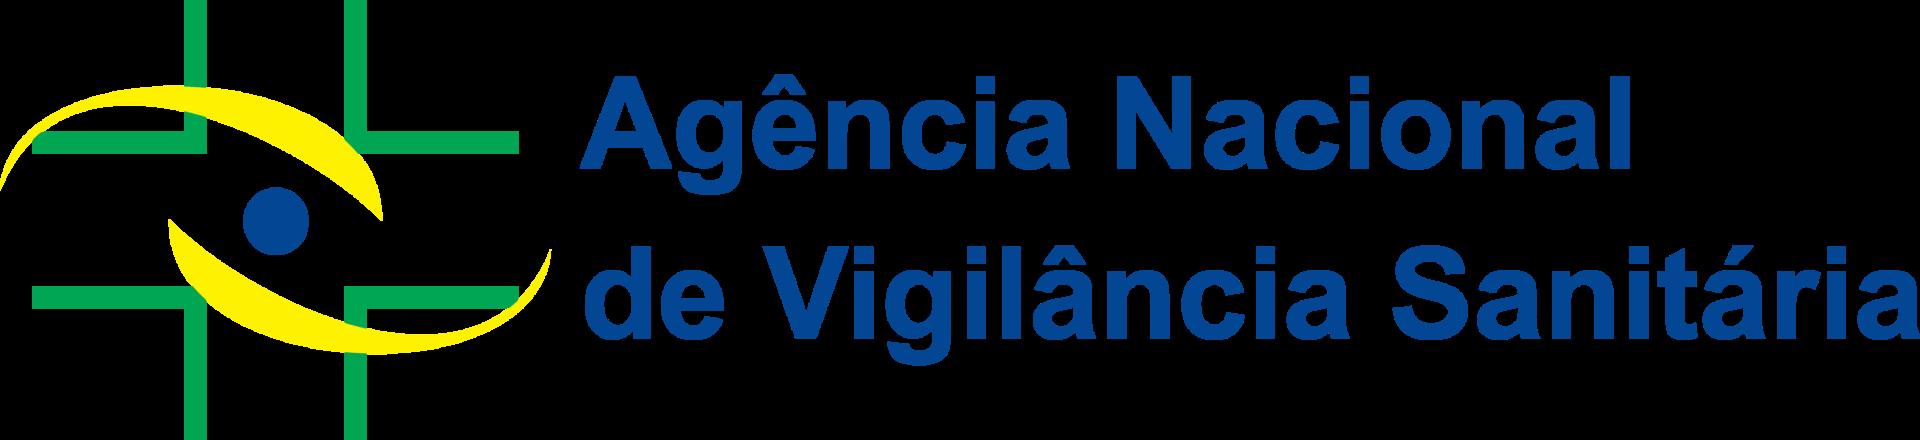 https://s3.amazonaws.com/dinder.com.br/wp-content/uploads/sites/619/2020/10/anvisa-logo.png